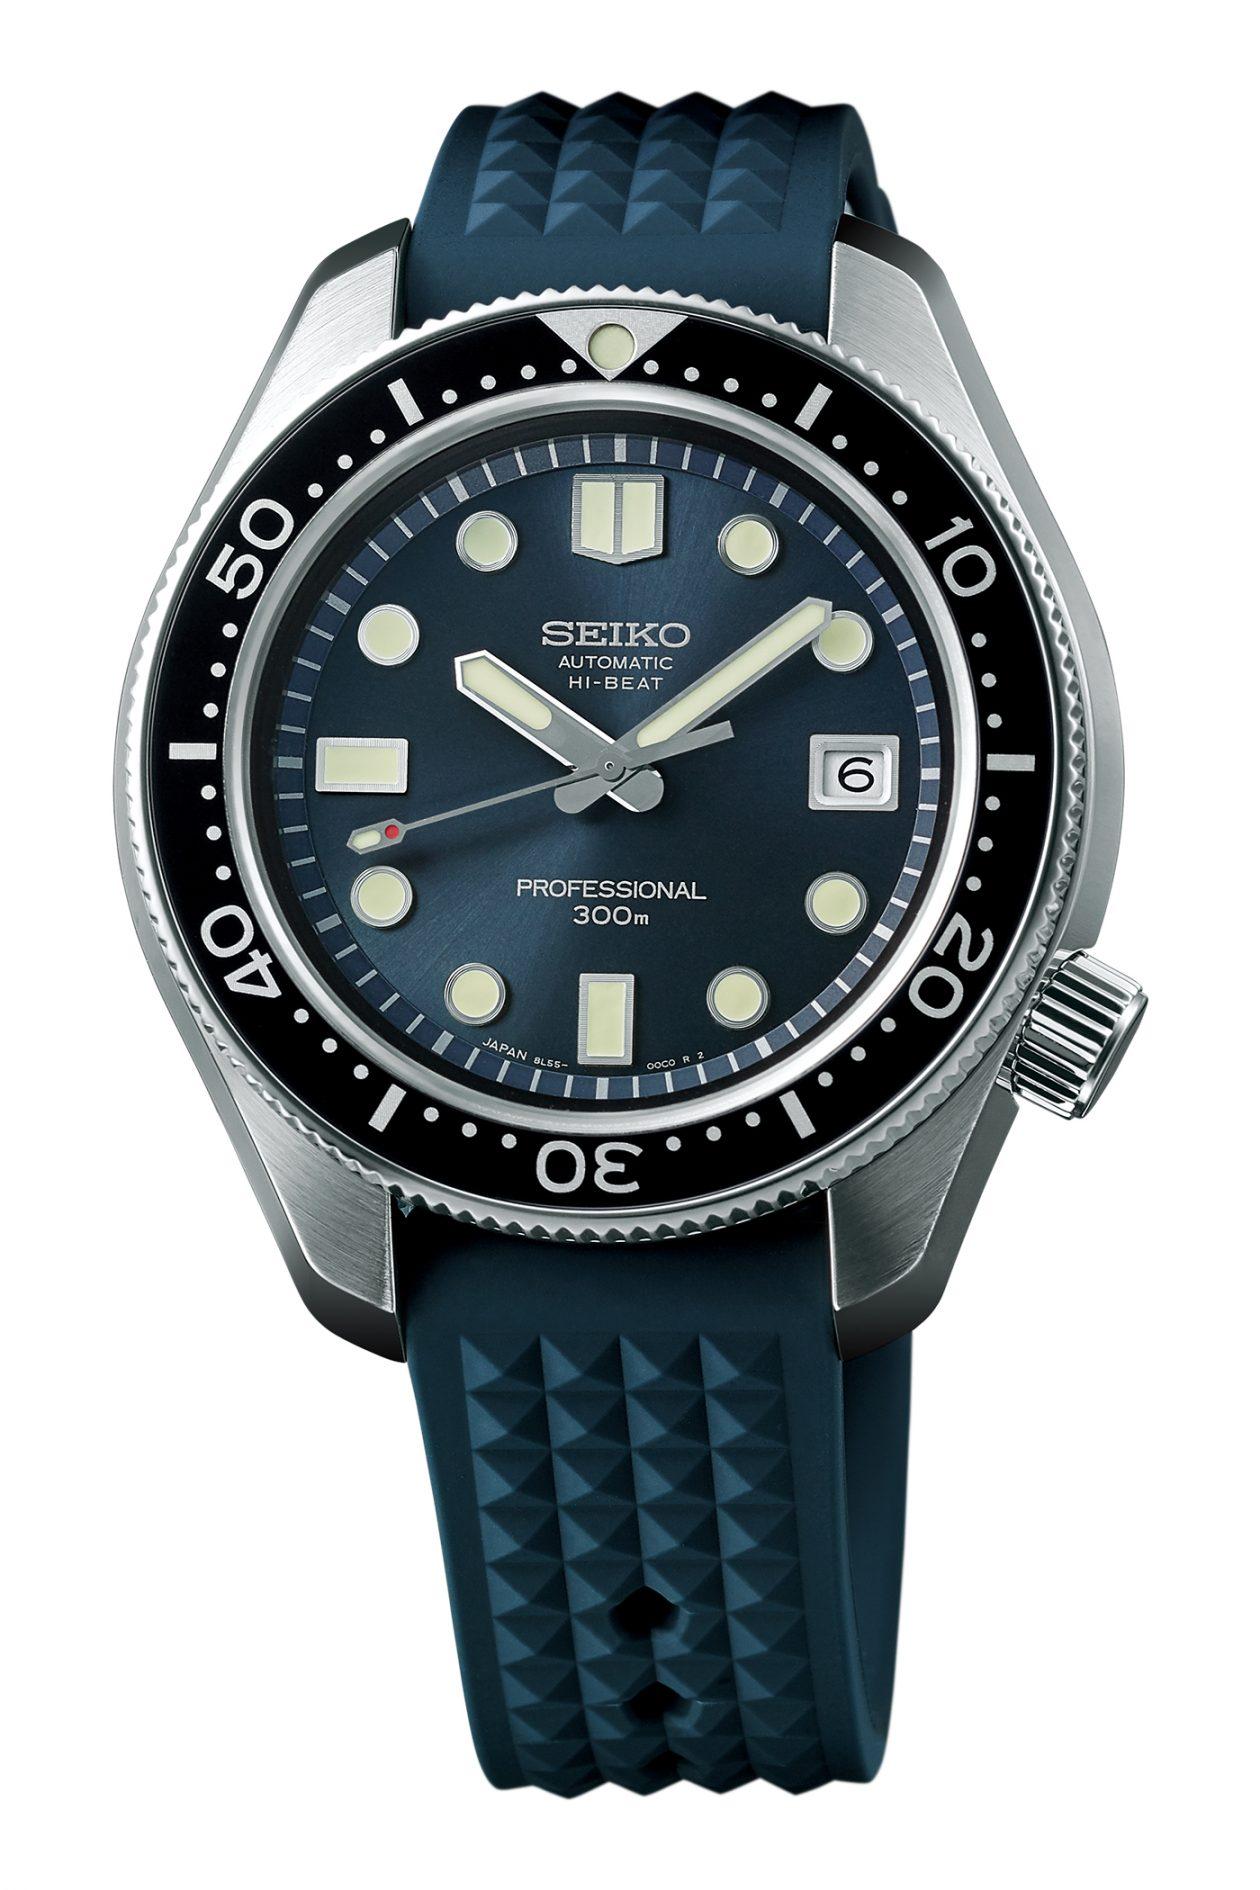 Seiko 1968 Professional Diver's 300m Re-creation (SLA039)